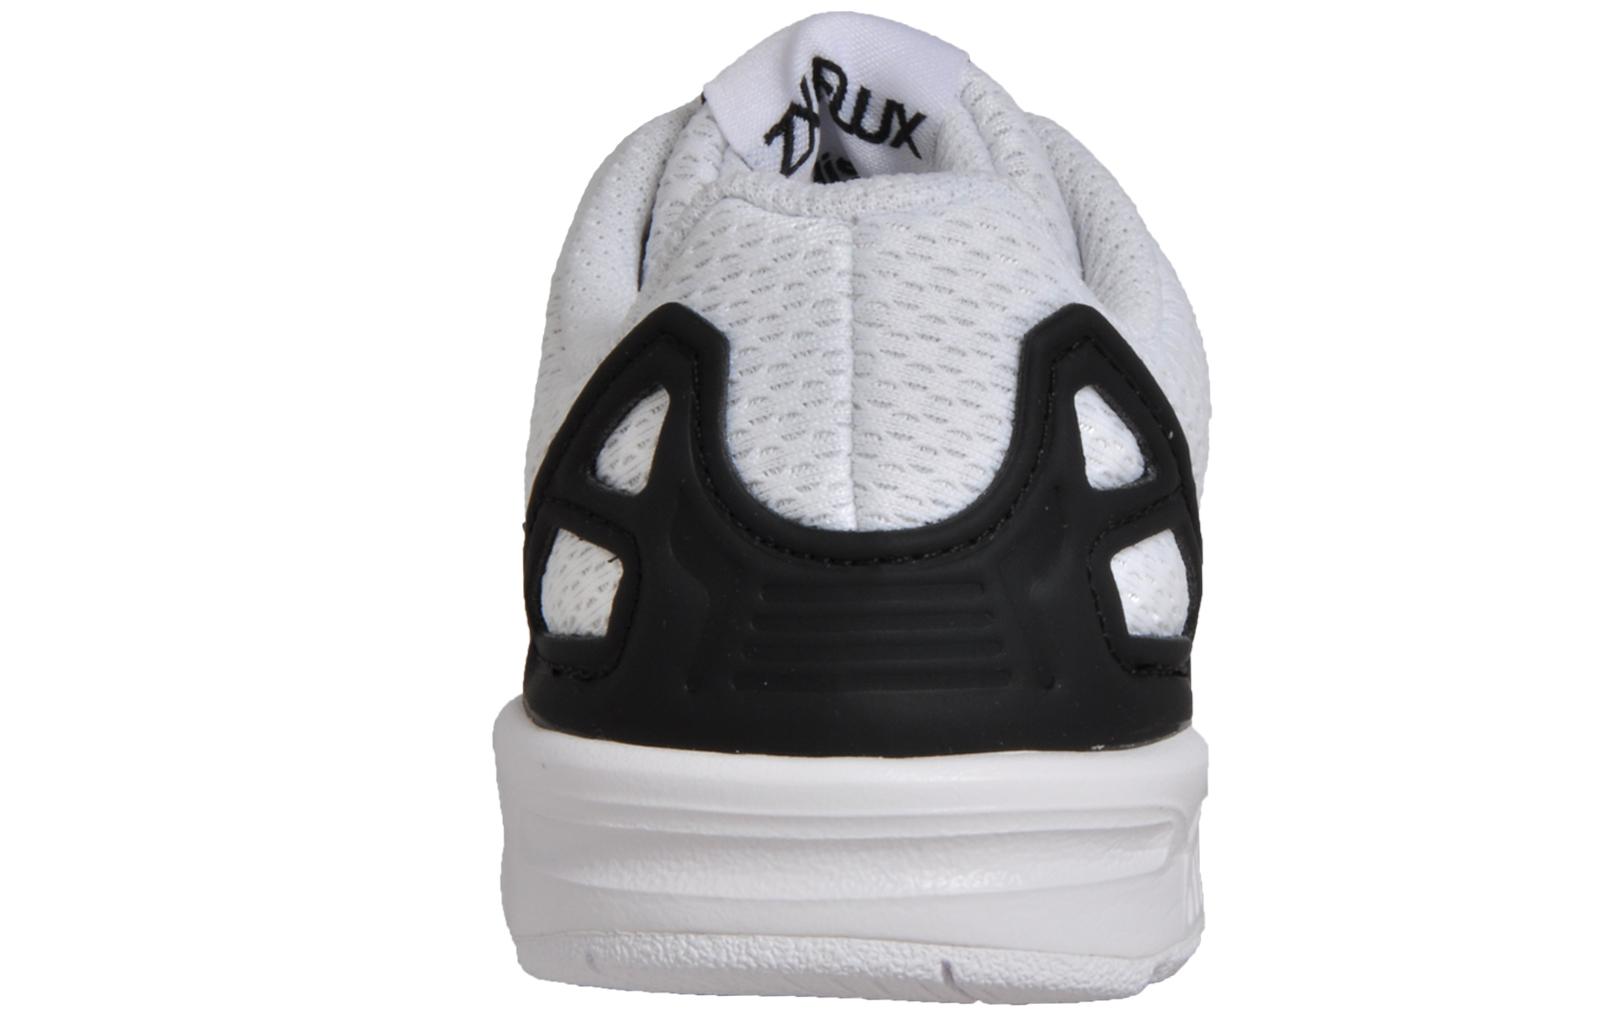 Adidas Originals ZX Flux EL Infants Toddlers Babies Classic Casual Trainers  White d64038c948e